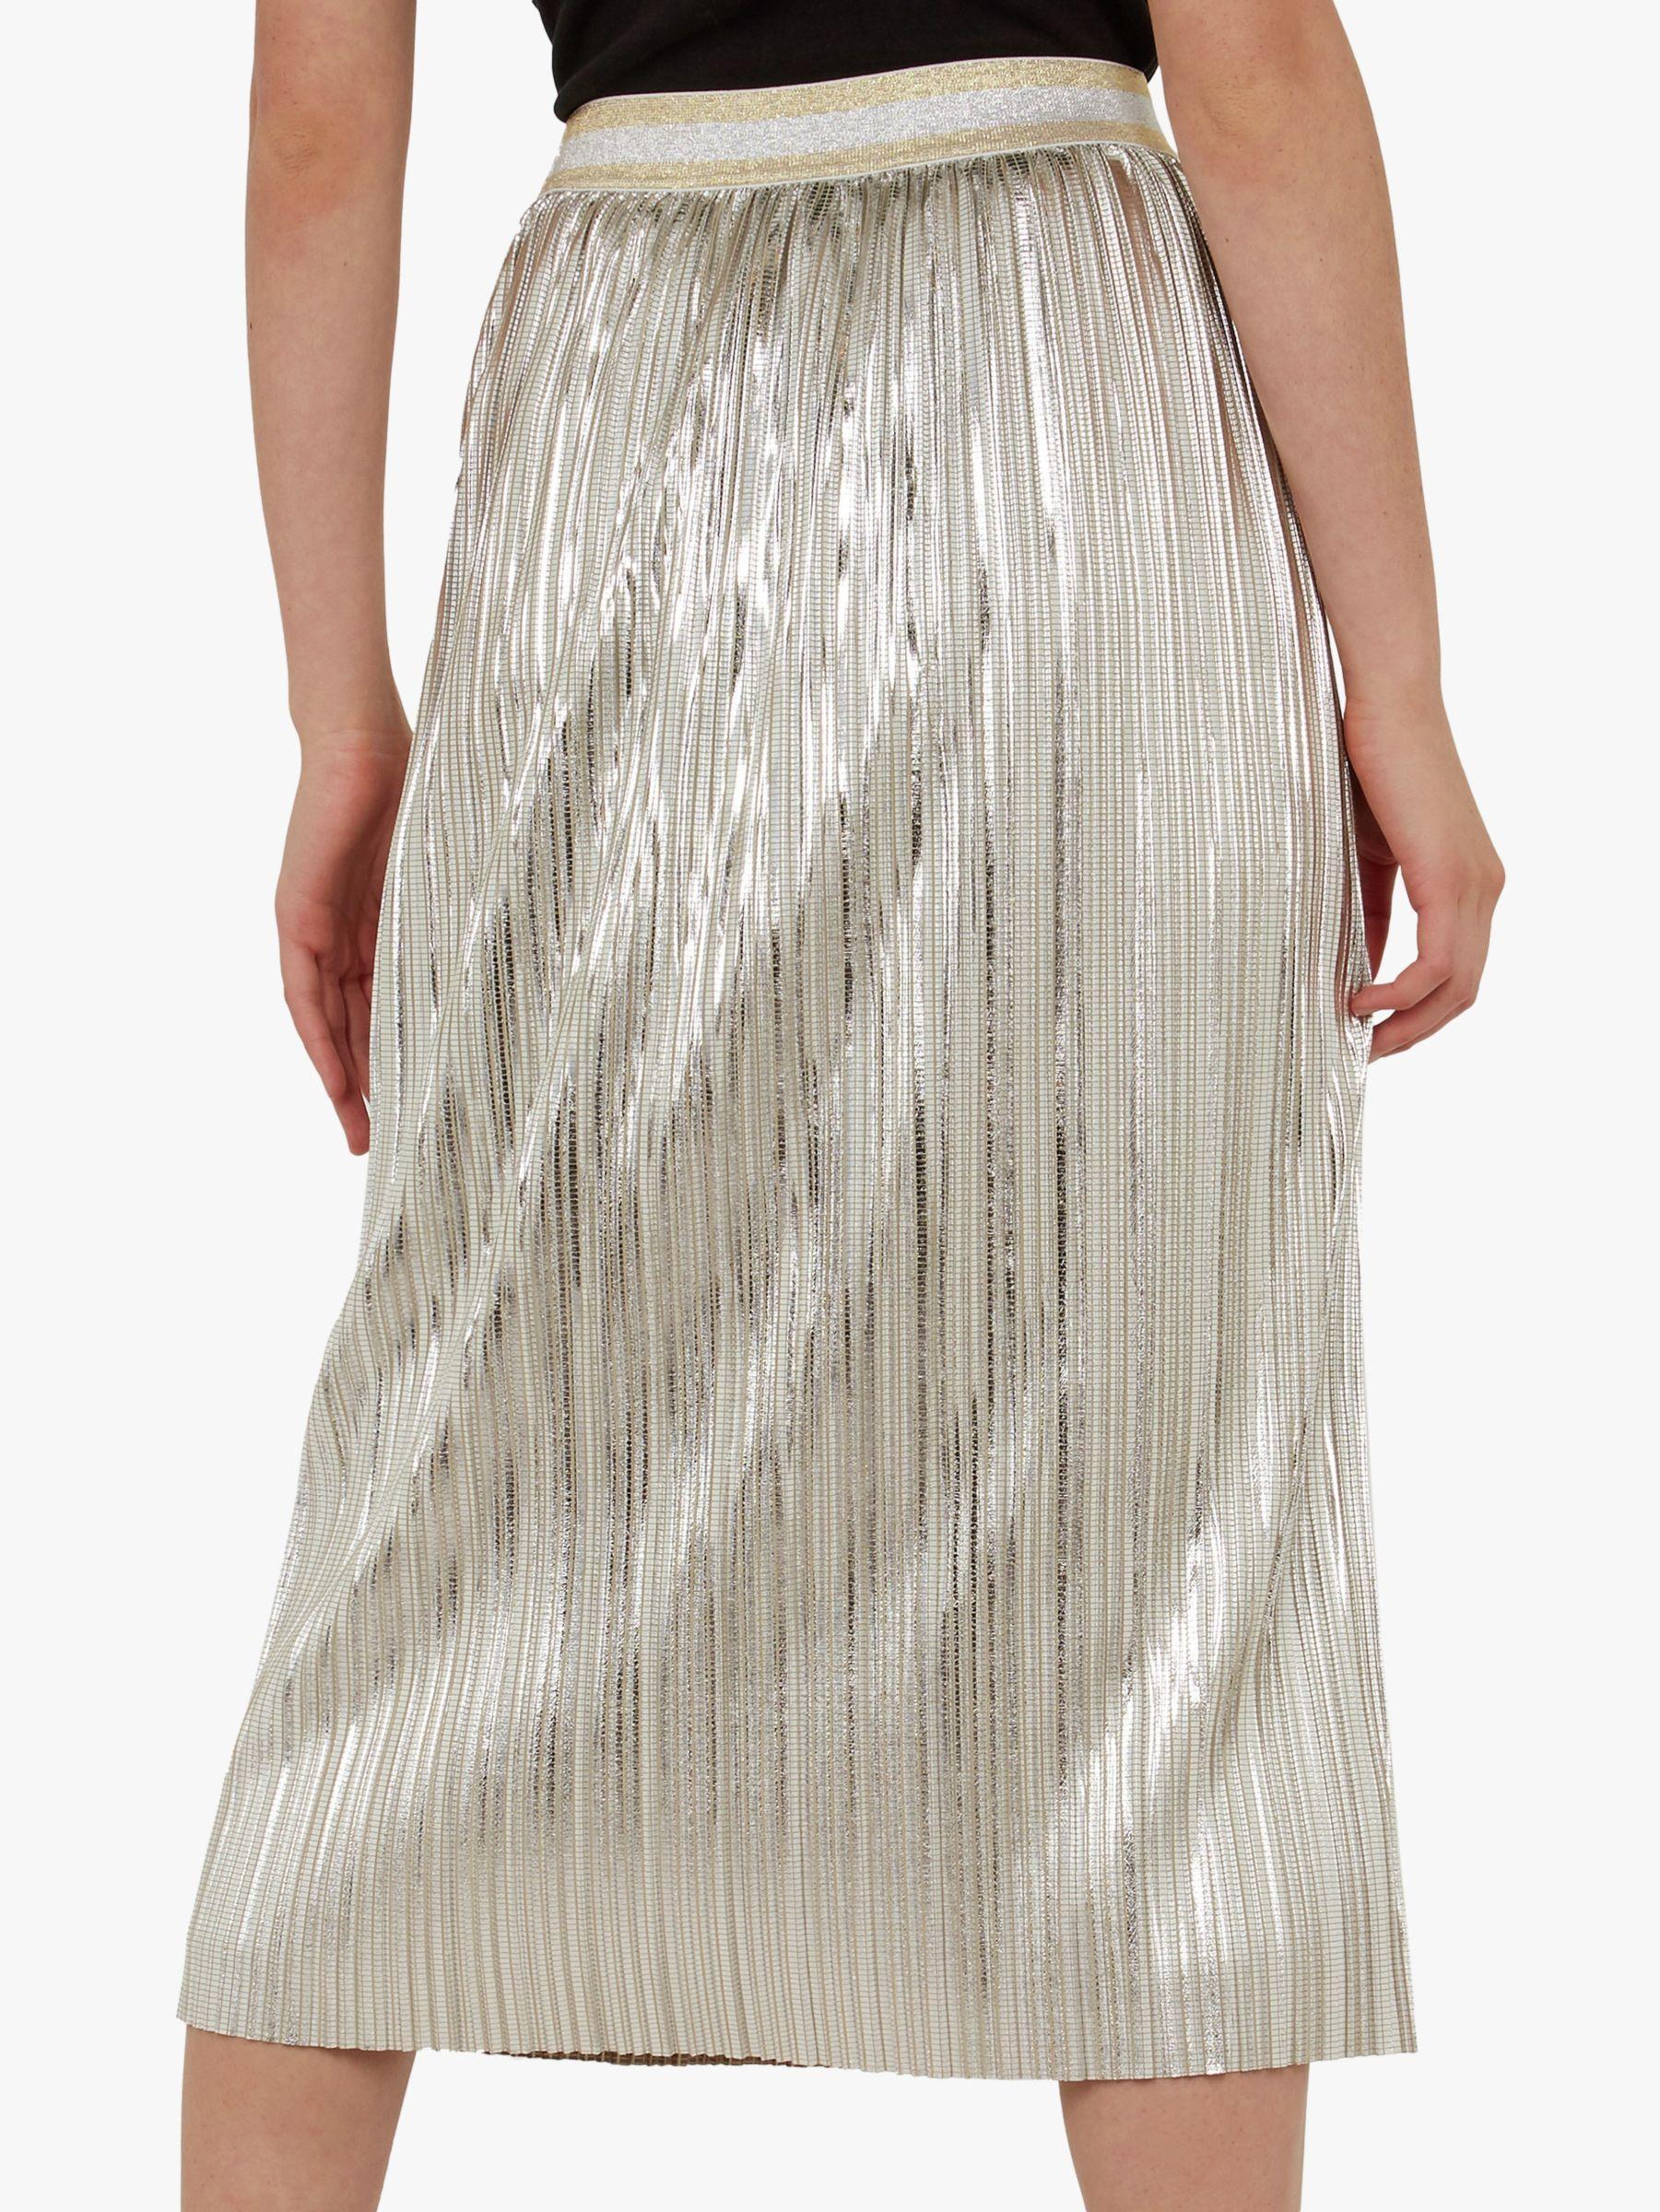 5b272e8073 Ted Baker Ariana Metallic Pleated Midi Skirt in Gray - Lyst